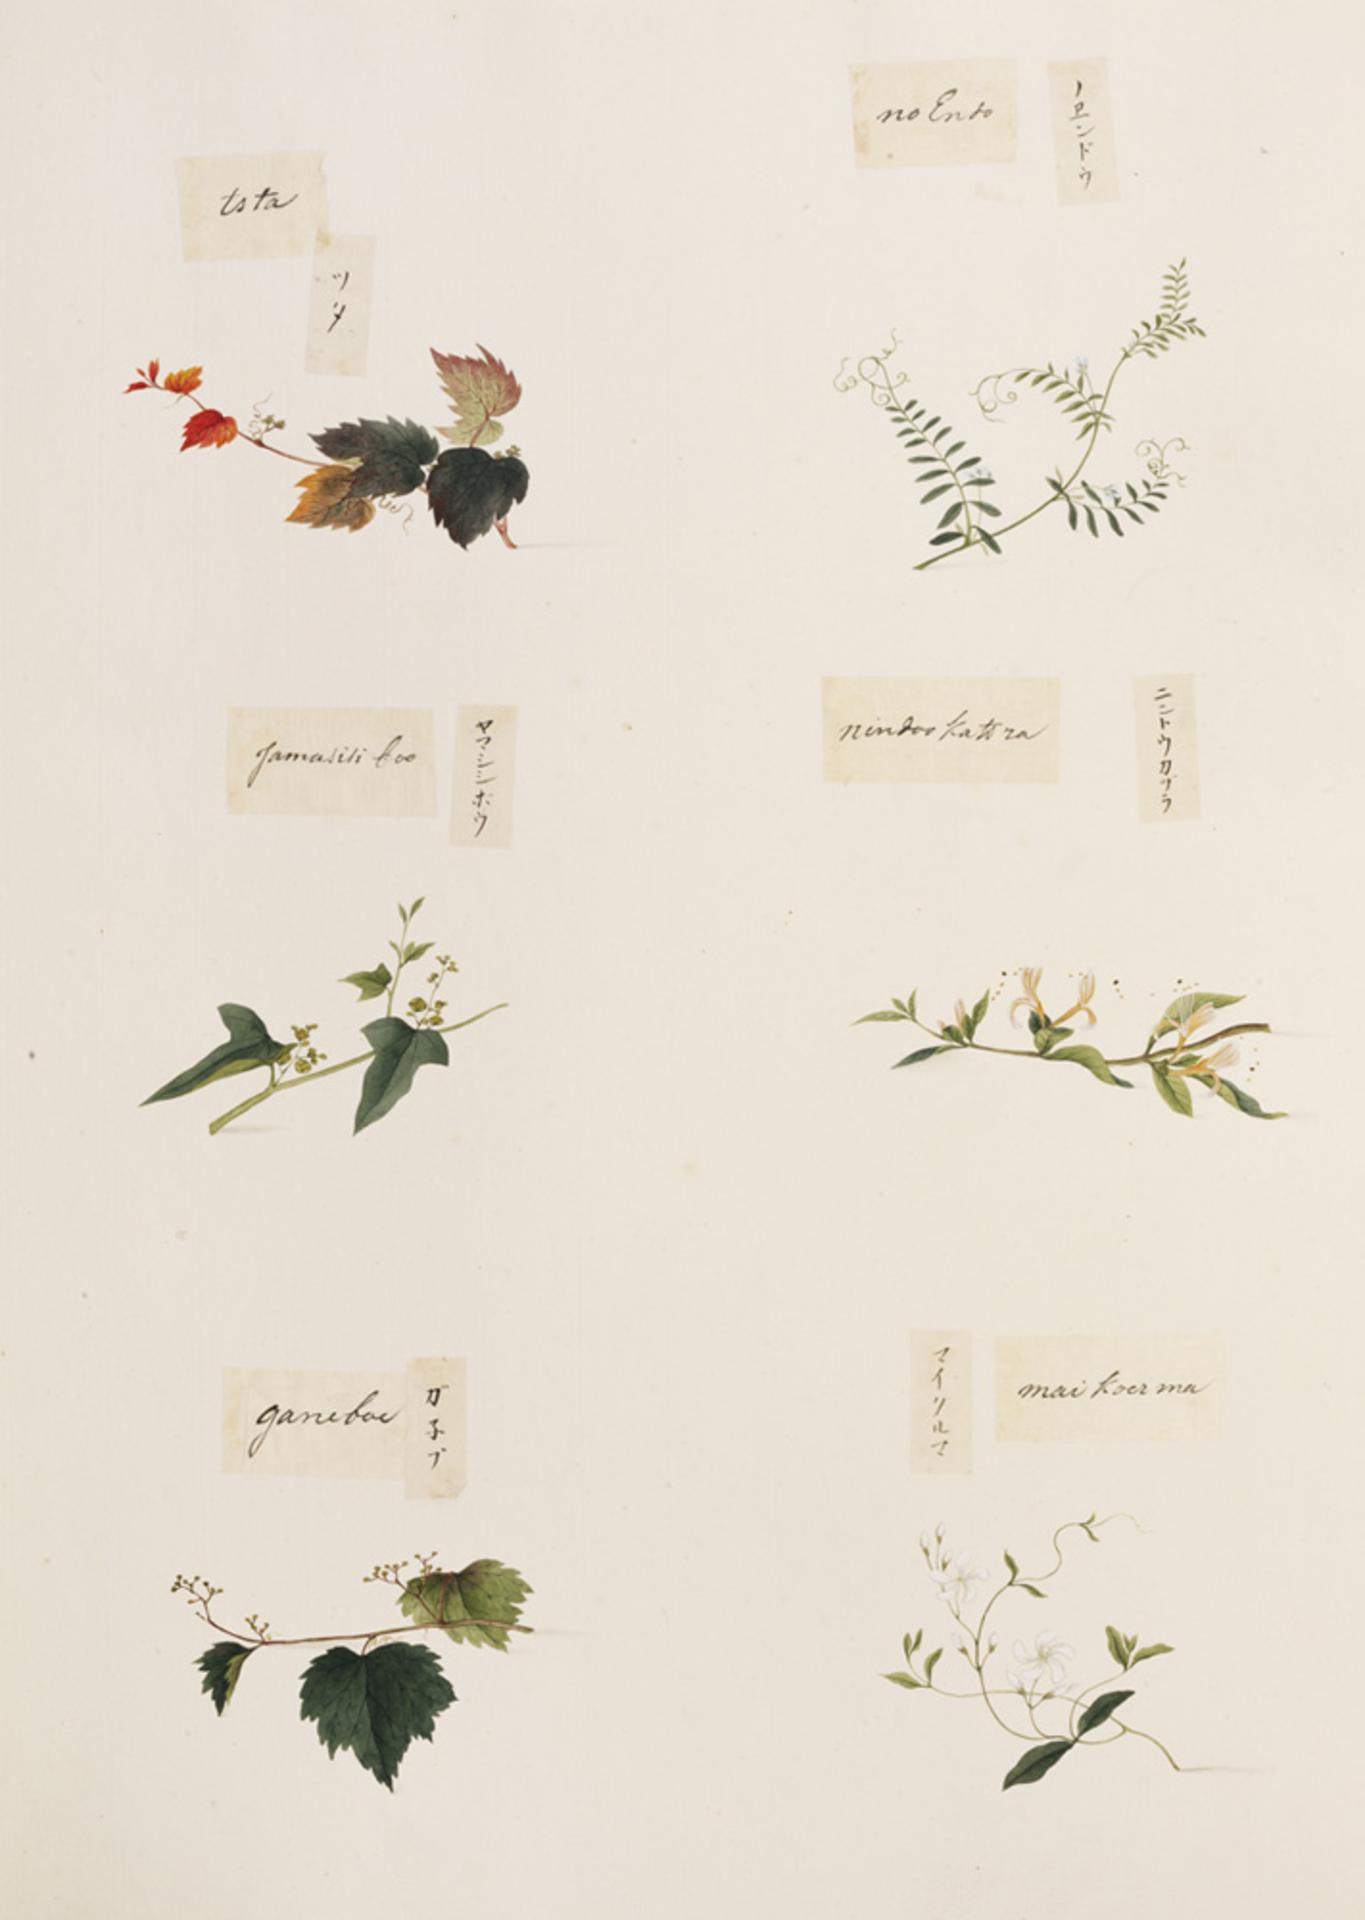 RMNH.ART.338 | Lonicera japonica